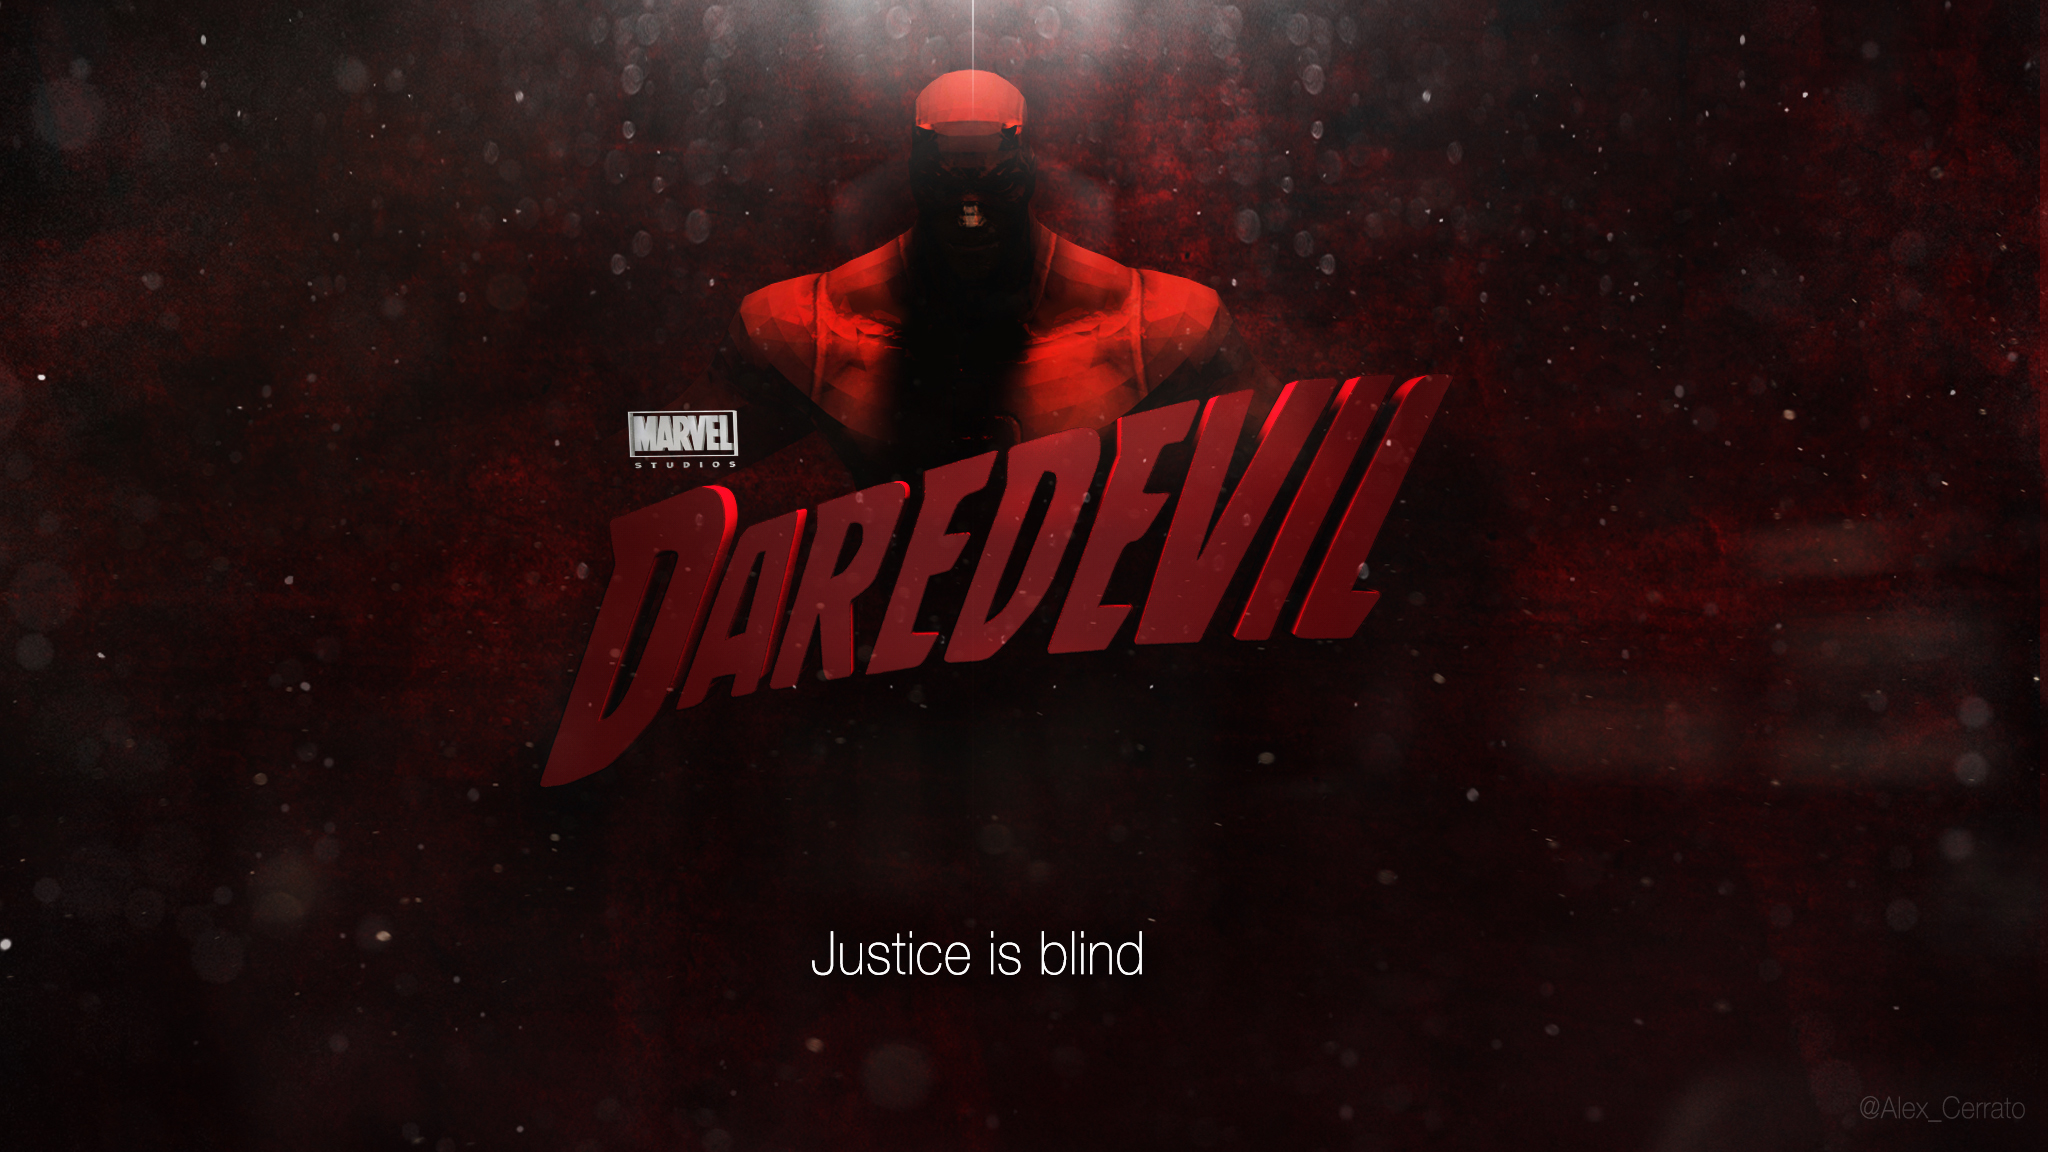 Daredevil TV Series - Wallpaper